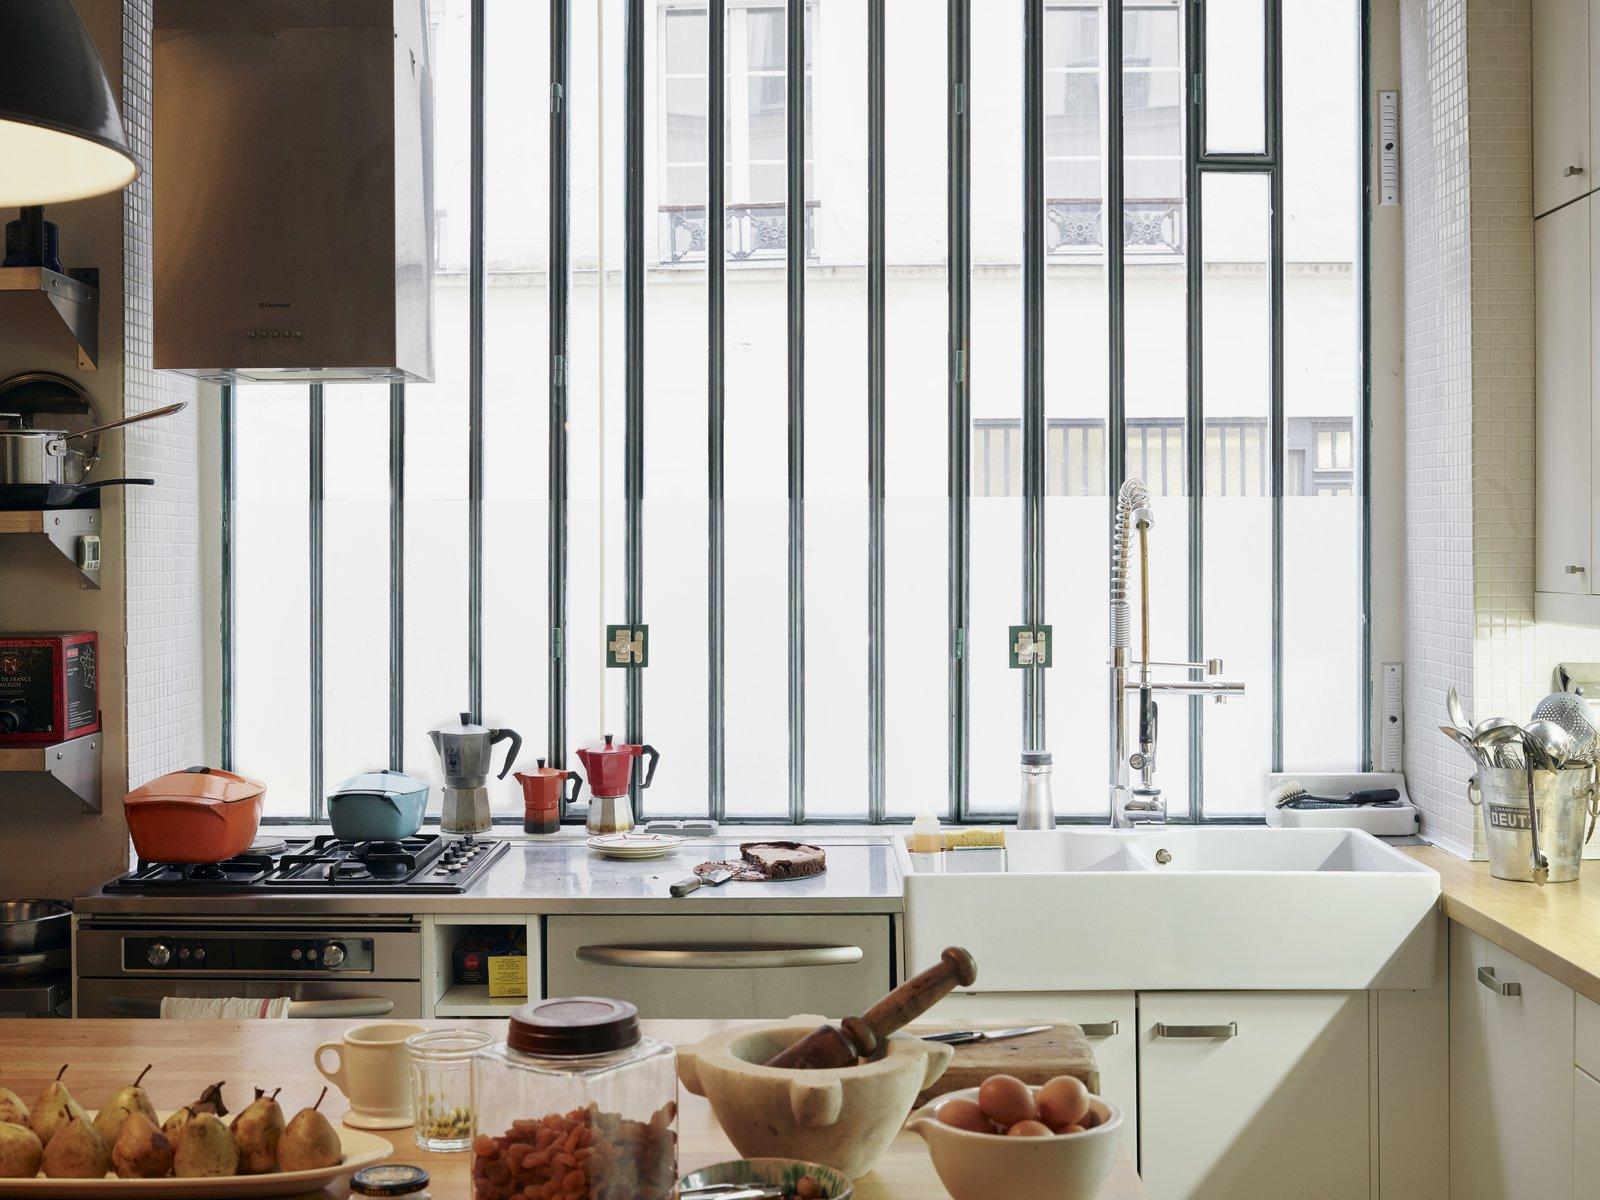 David Lebovitz' Paris kitchen